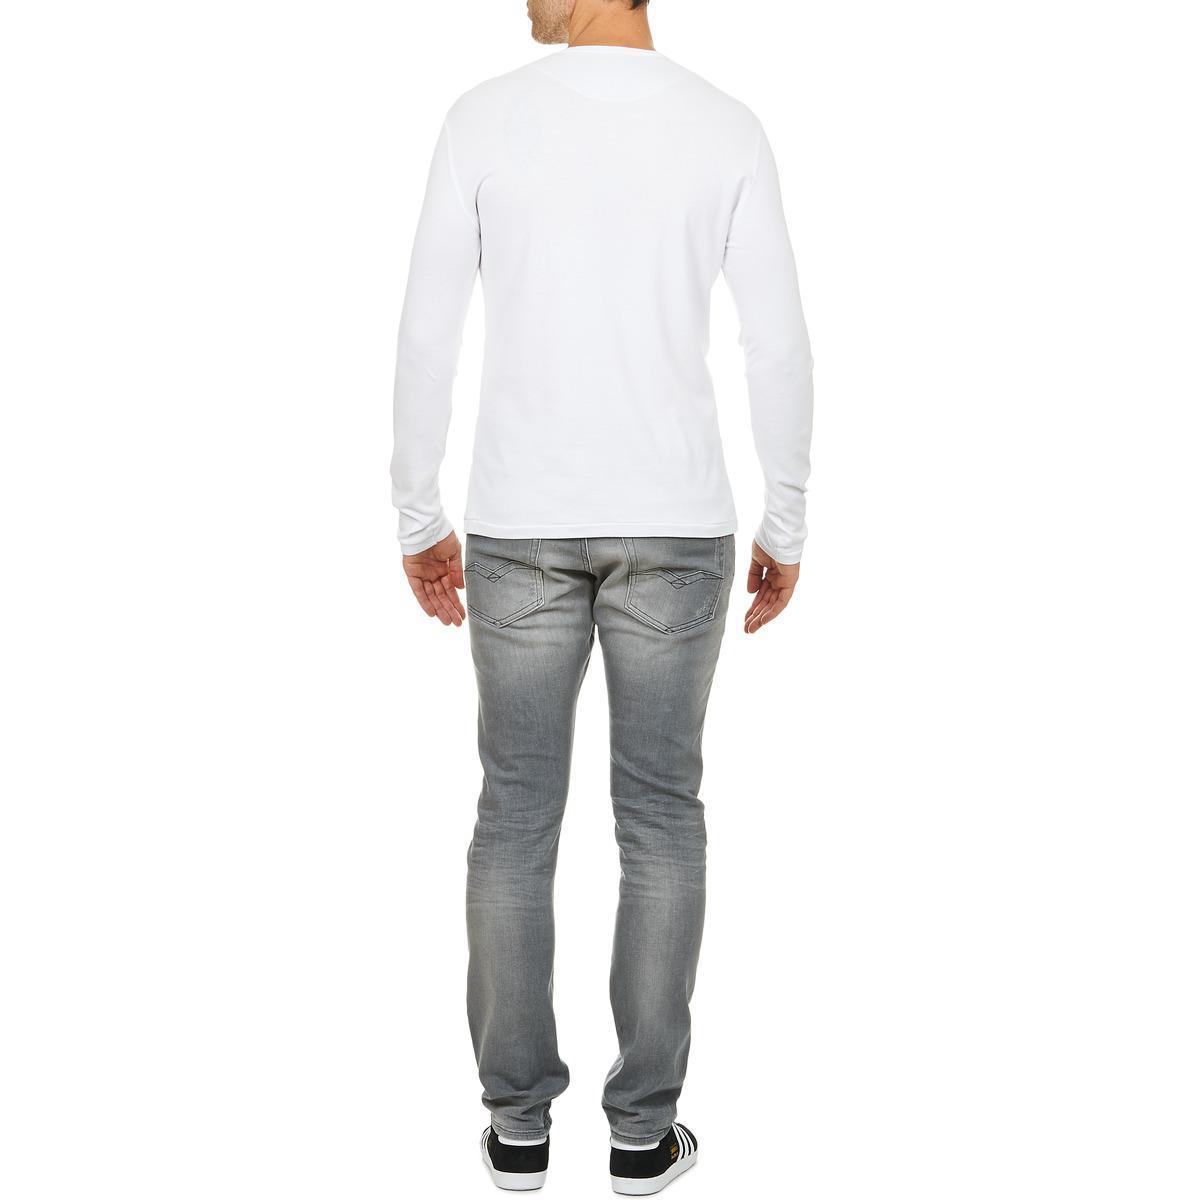 Replay Denim Waiton Jeans in Grey (Grey) for Men